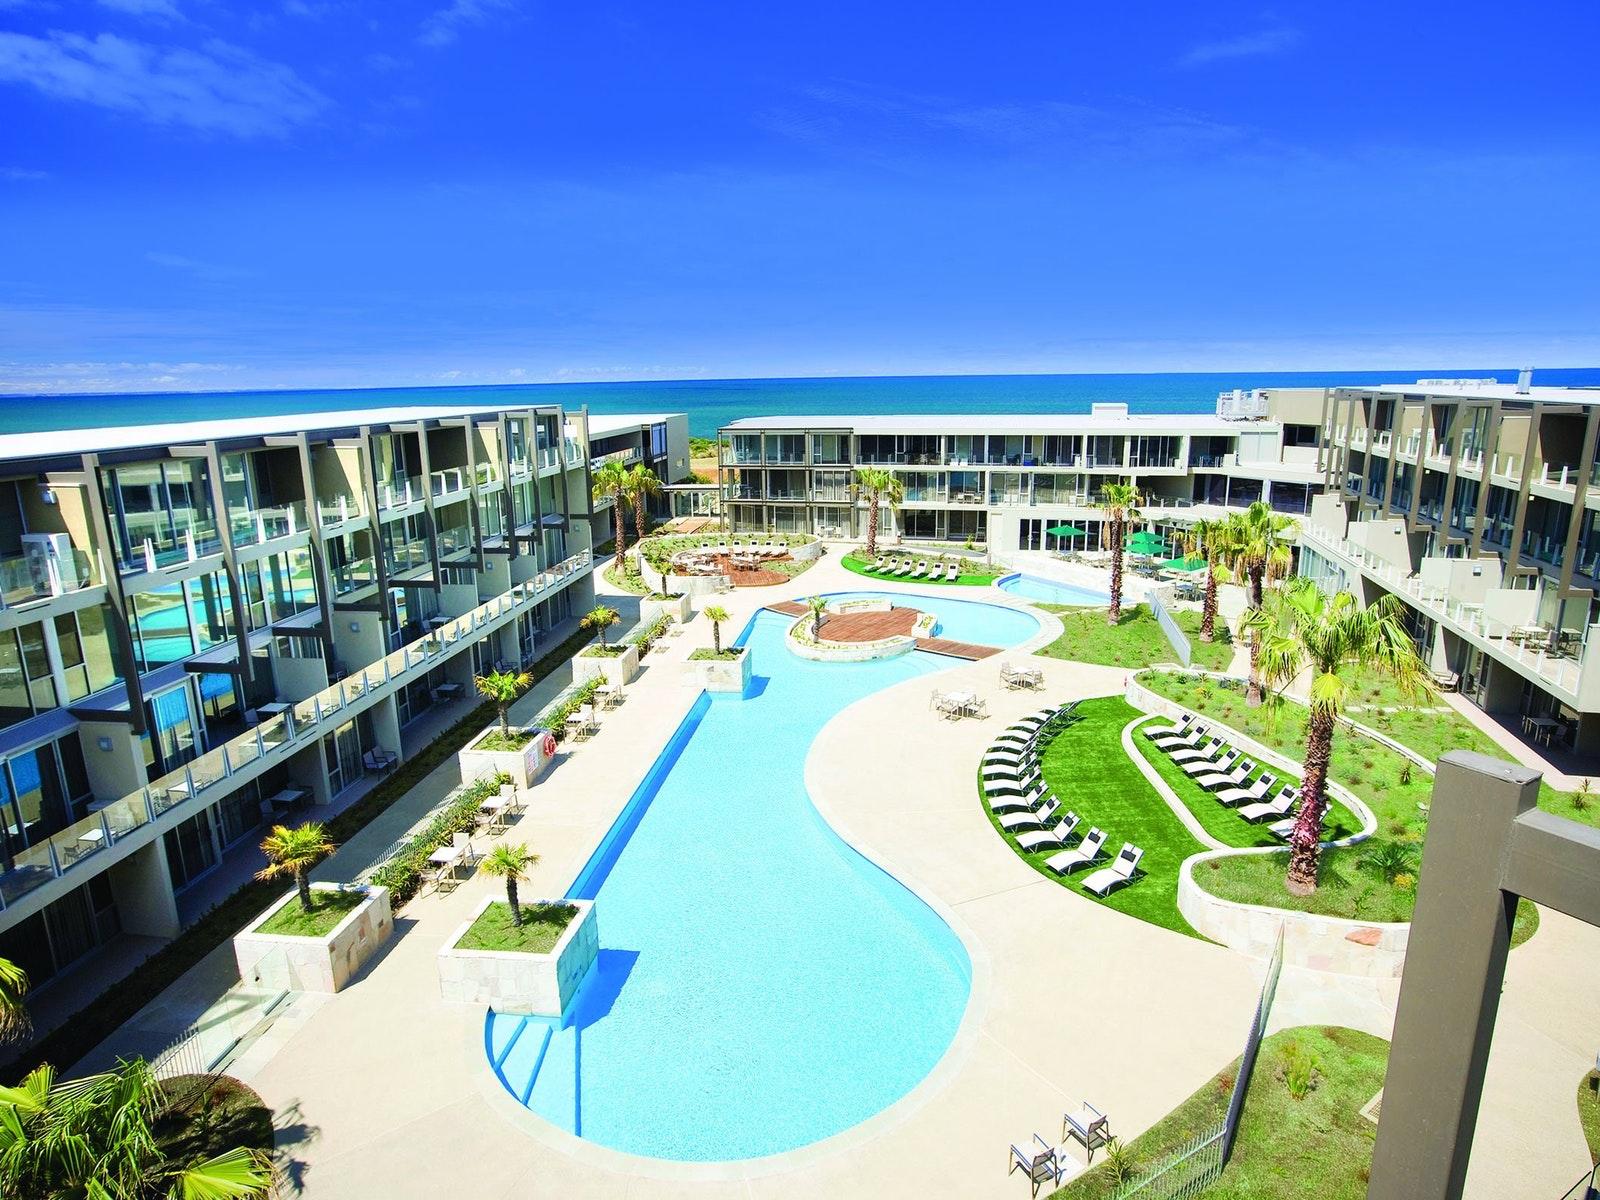 Wyndham Resort Torquay pool and hotel view